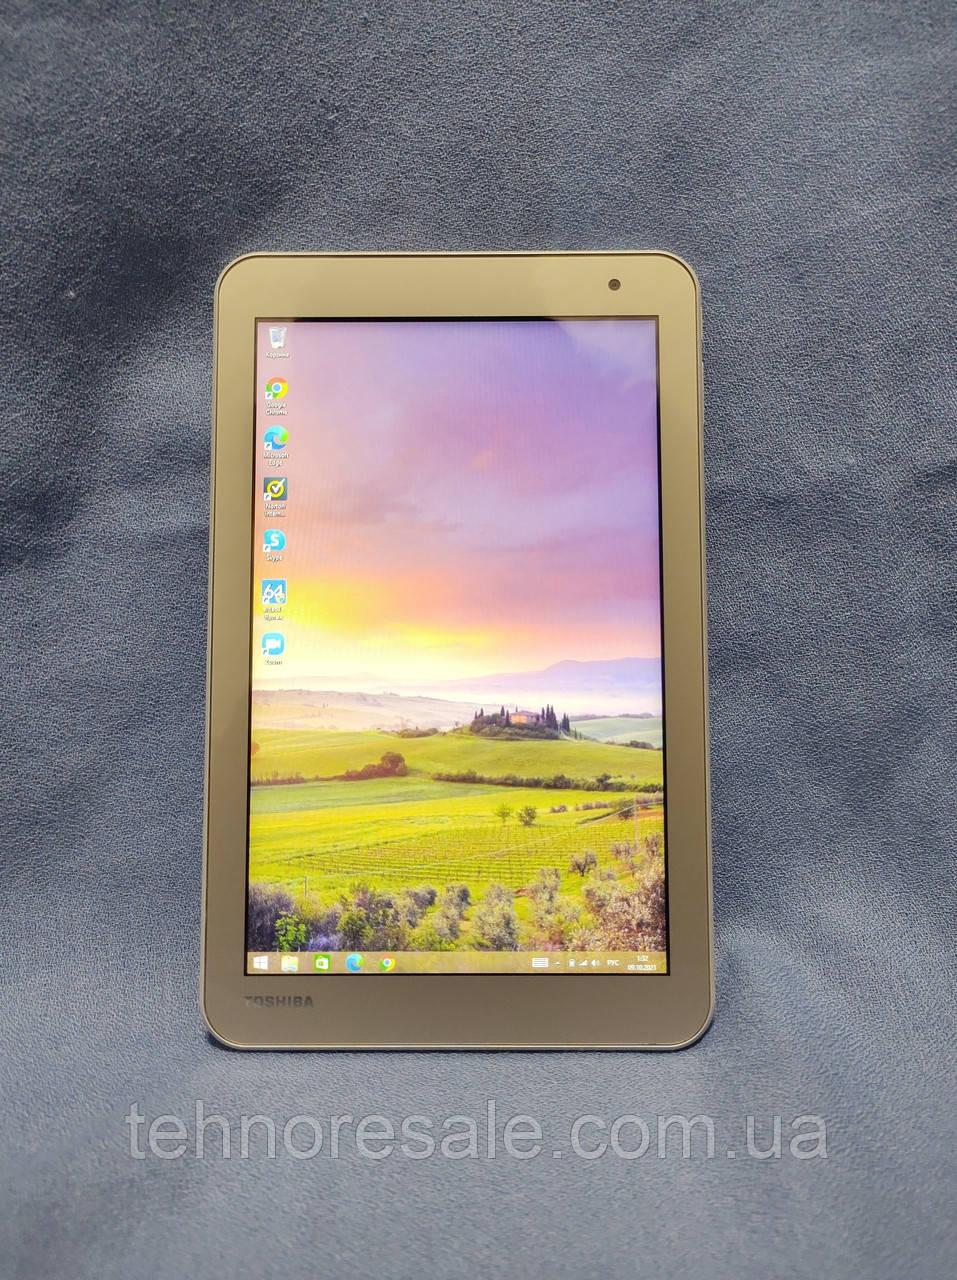 "Планшет Toshiba Encore 2 WT8-B64CN, 8"", 4 ядра, 2Gb/64Gb+64Gb, Windows, WI-FI+Bluetooth, GPS"